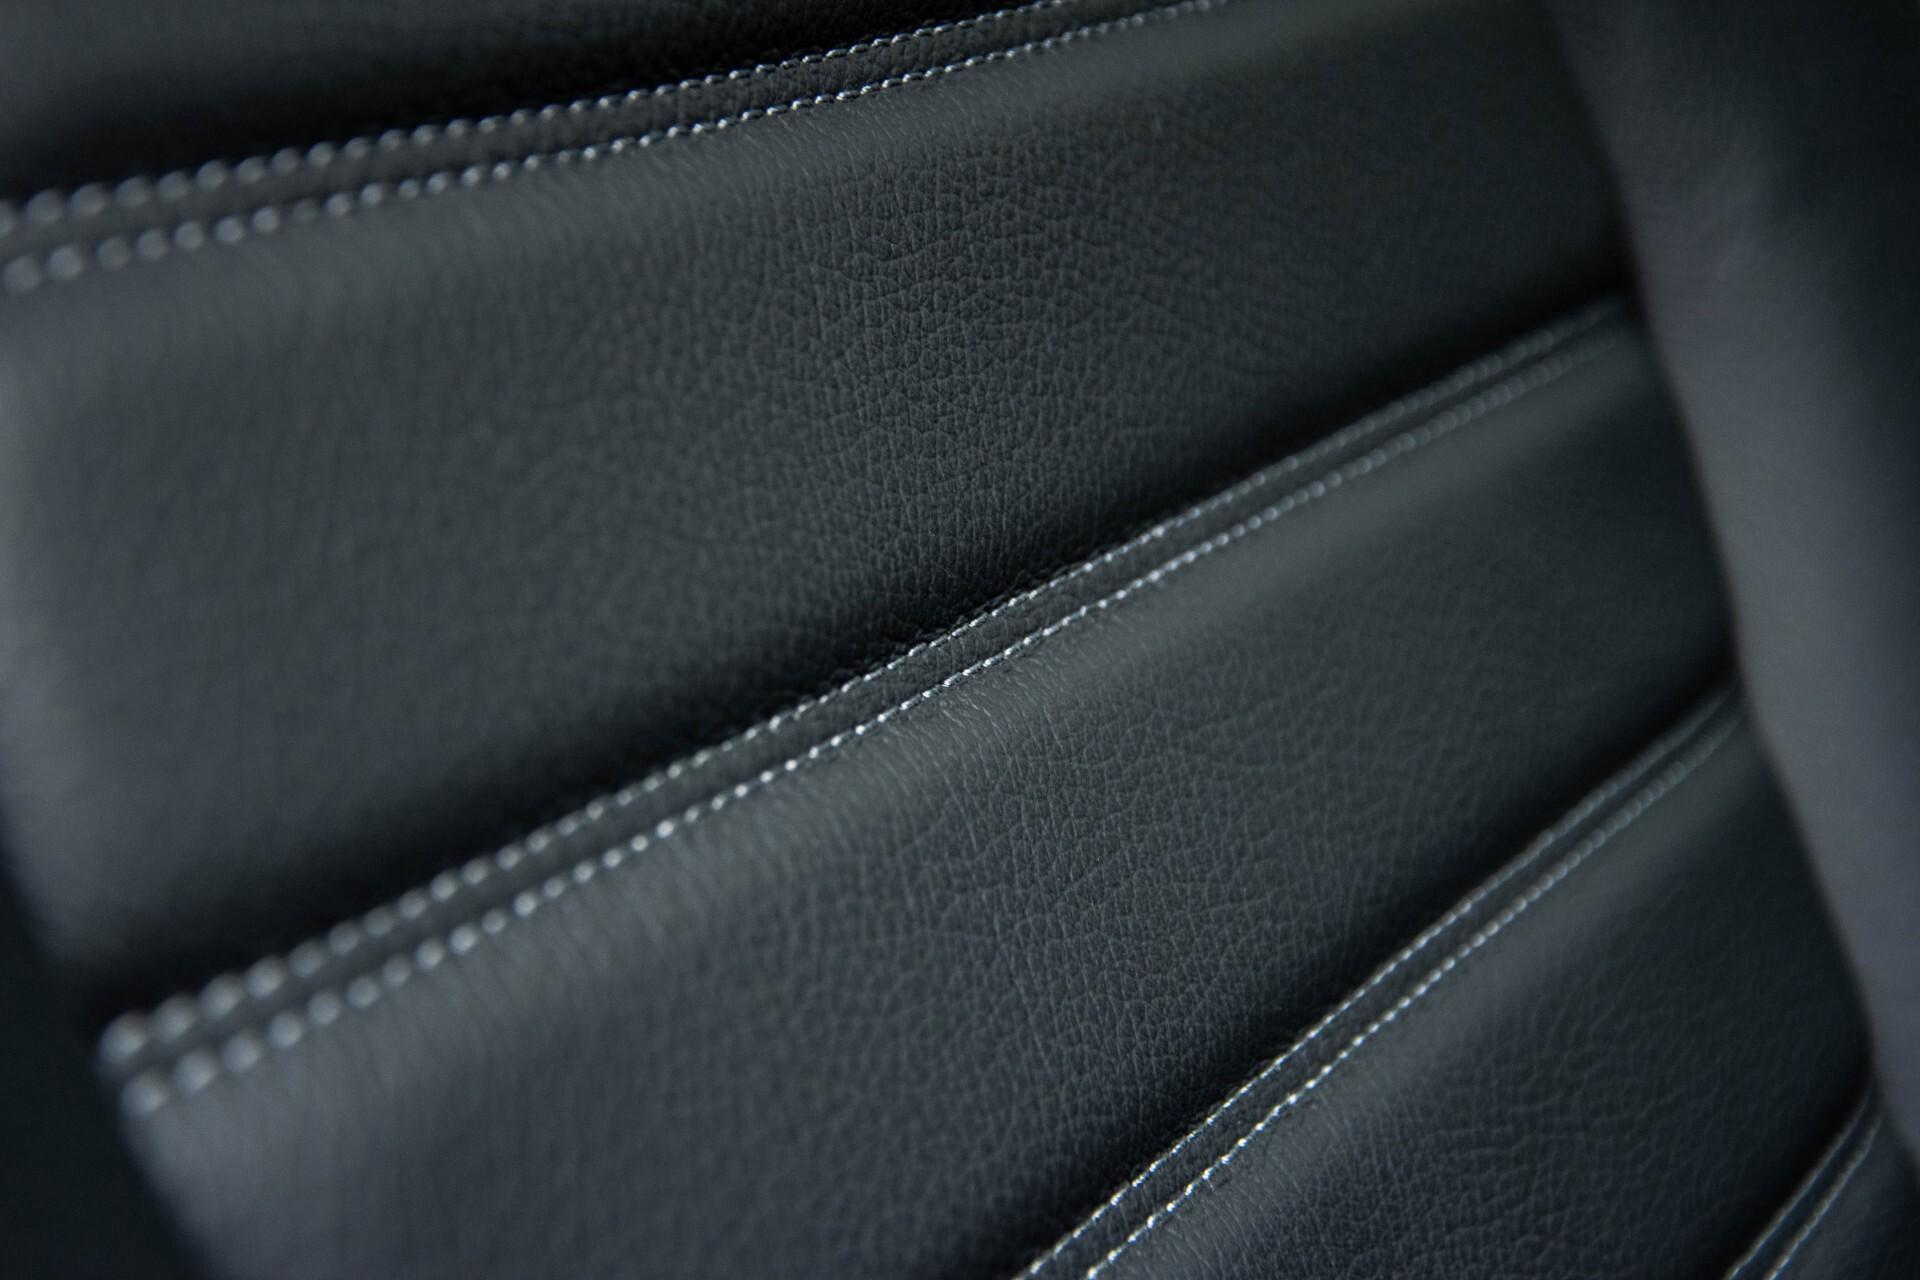 Mercedes-Benz GLC 200 4-M AMG Night/Panorama/Distronic Pro/Burmester/360camera/Exclusive Aut9 Foto 50